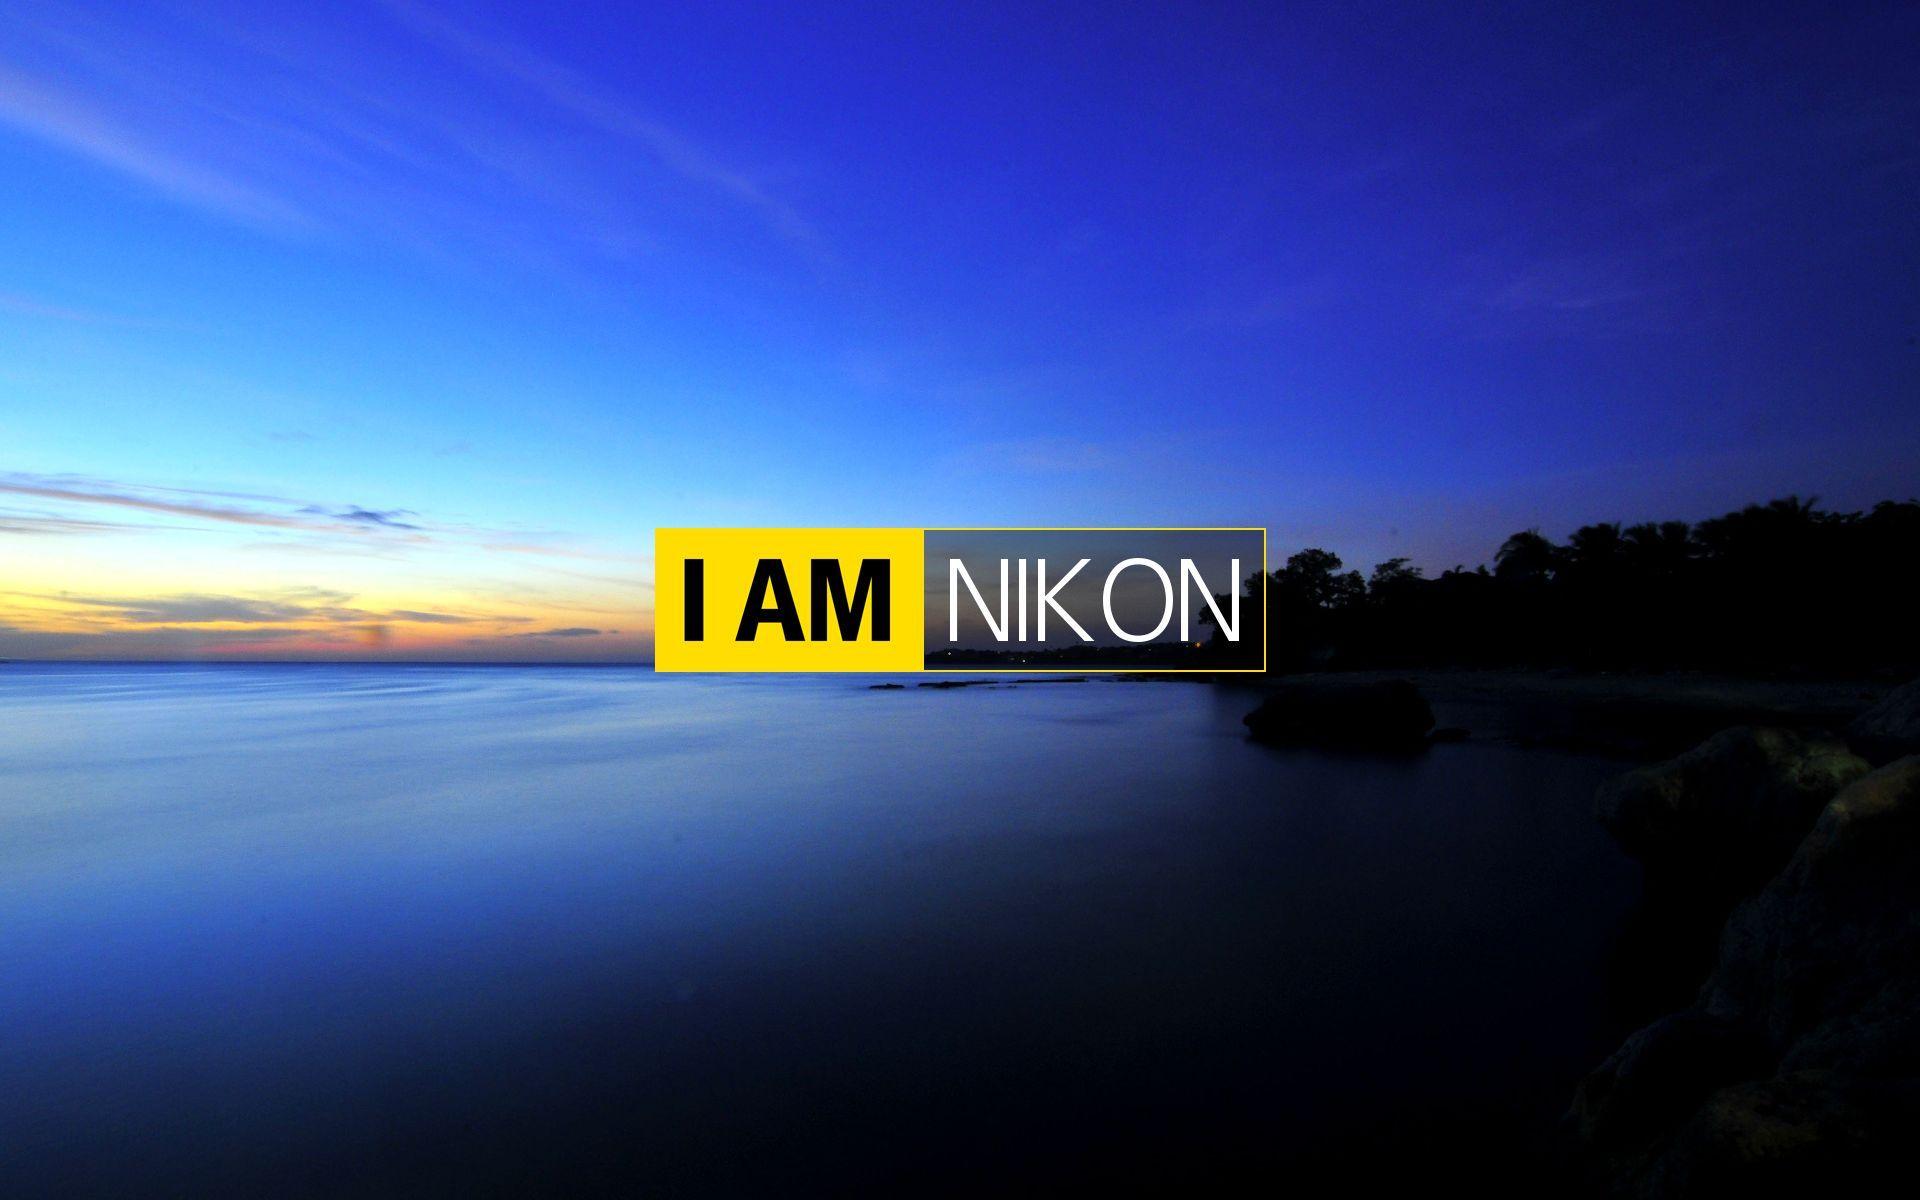 I Am Nikon Nikon Photography Digital